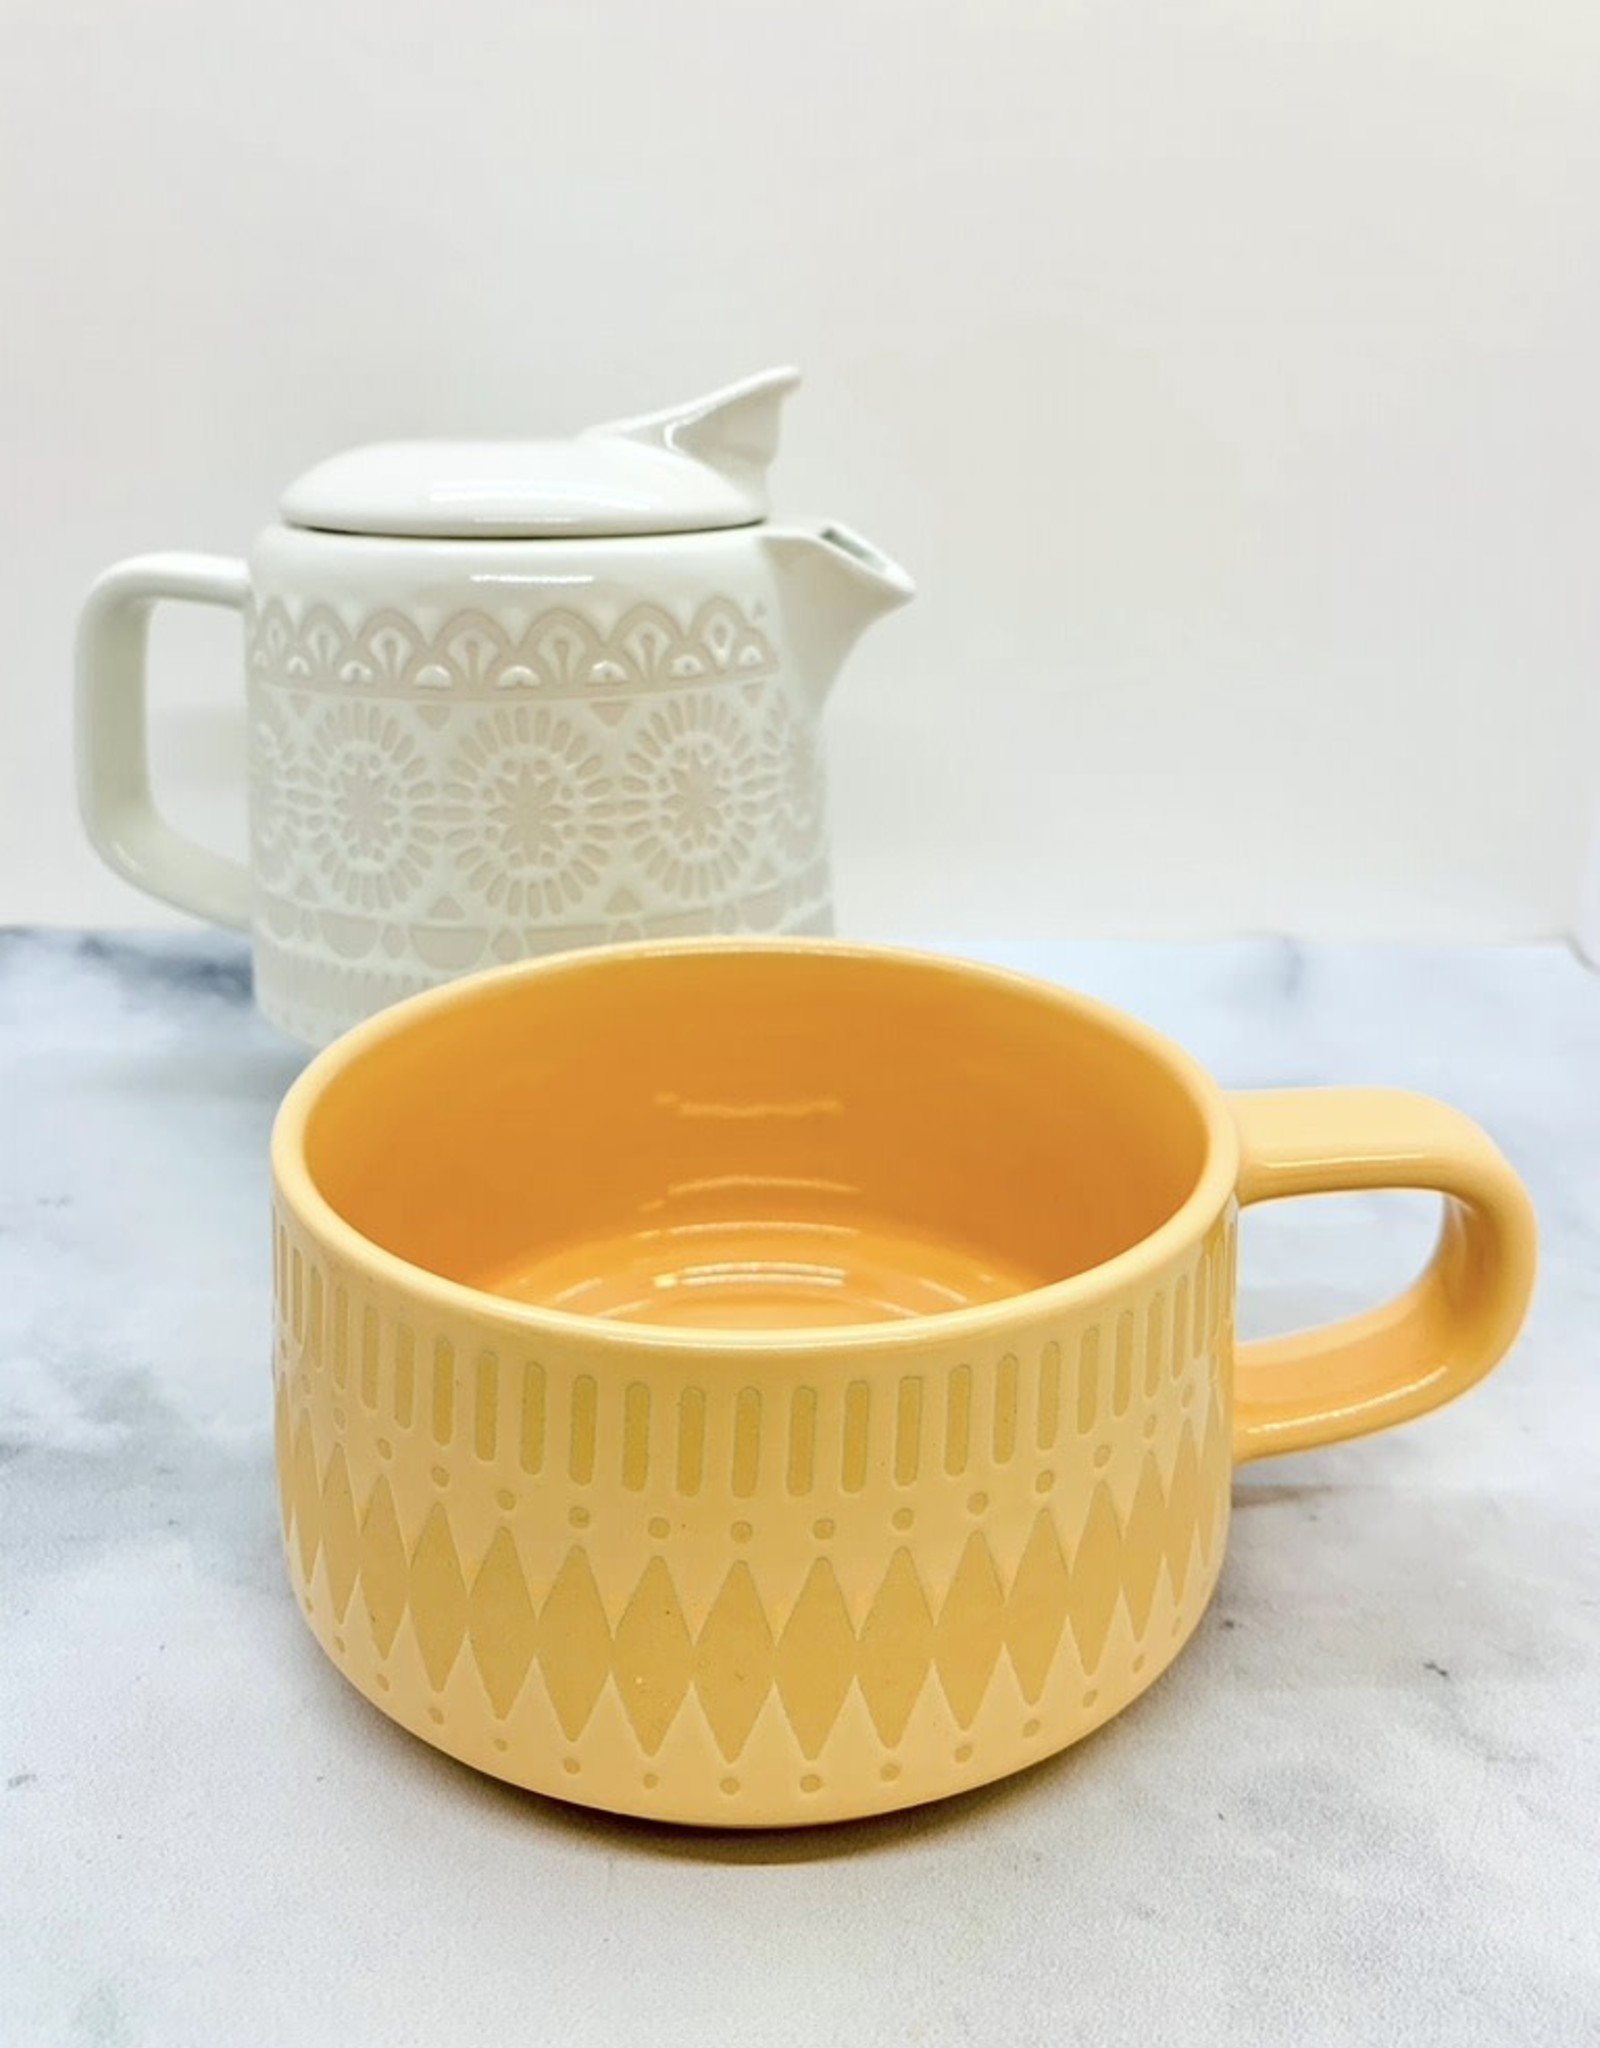 NOW Jubilee Tea For Me Set